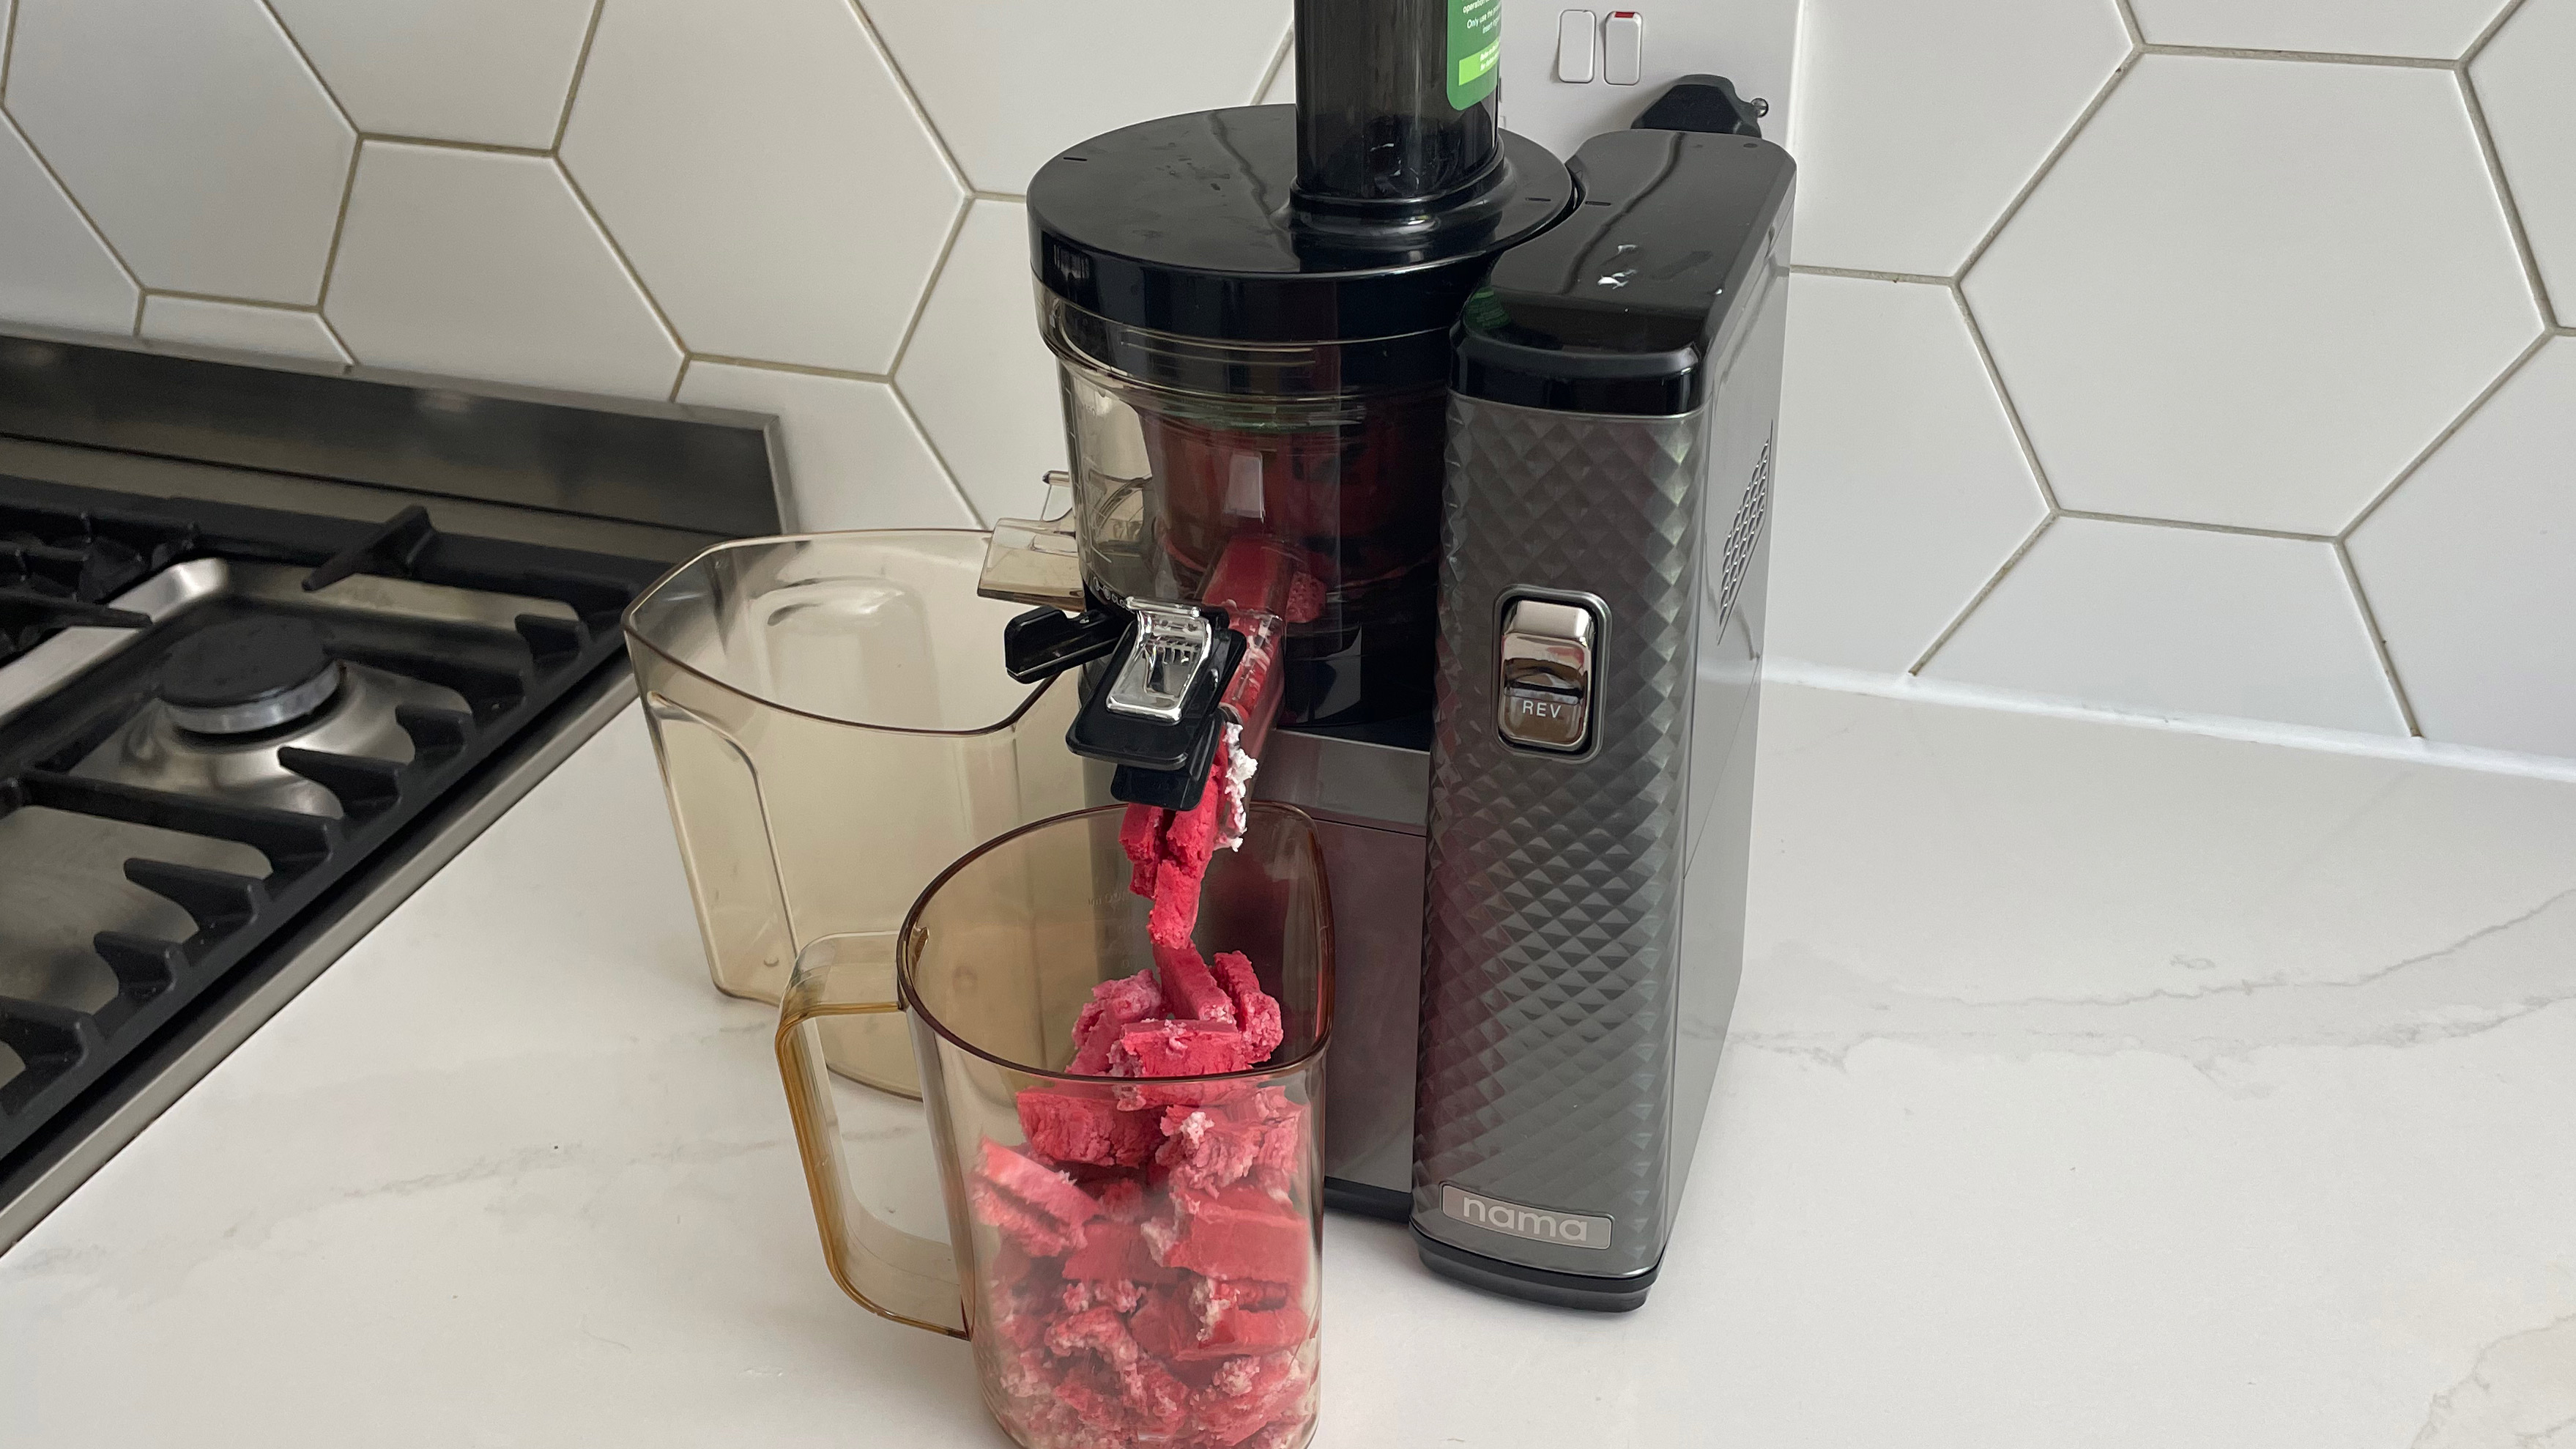 Nama Vitality 5800 on a kitchen countertop making raspberry and yoghurt sorbet